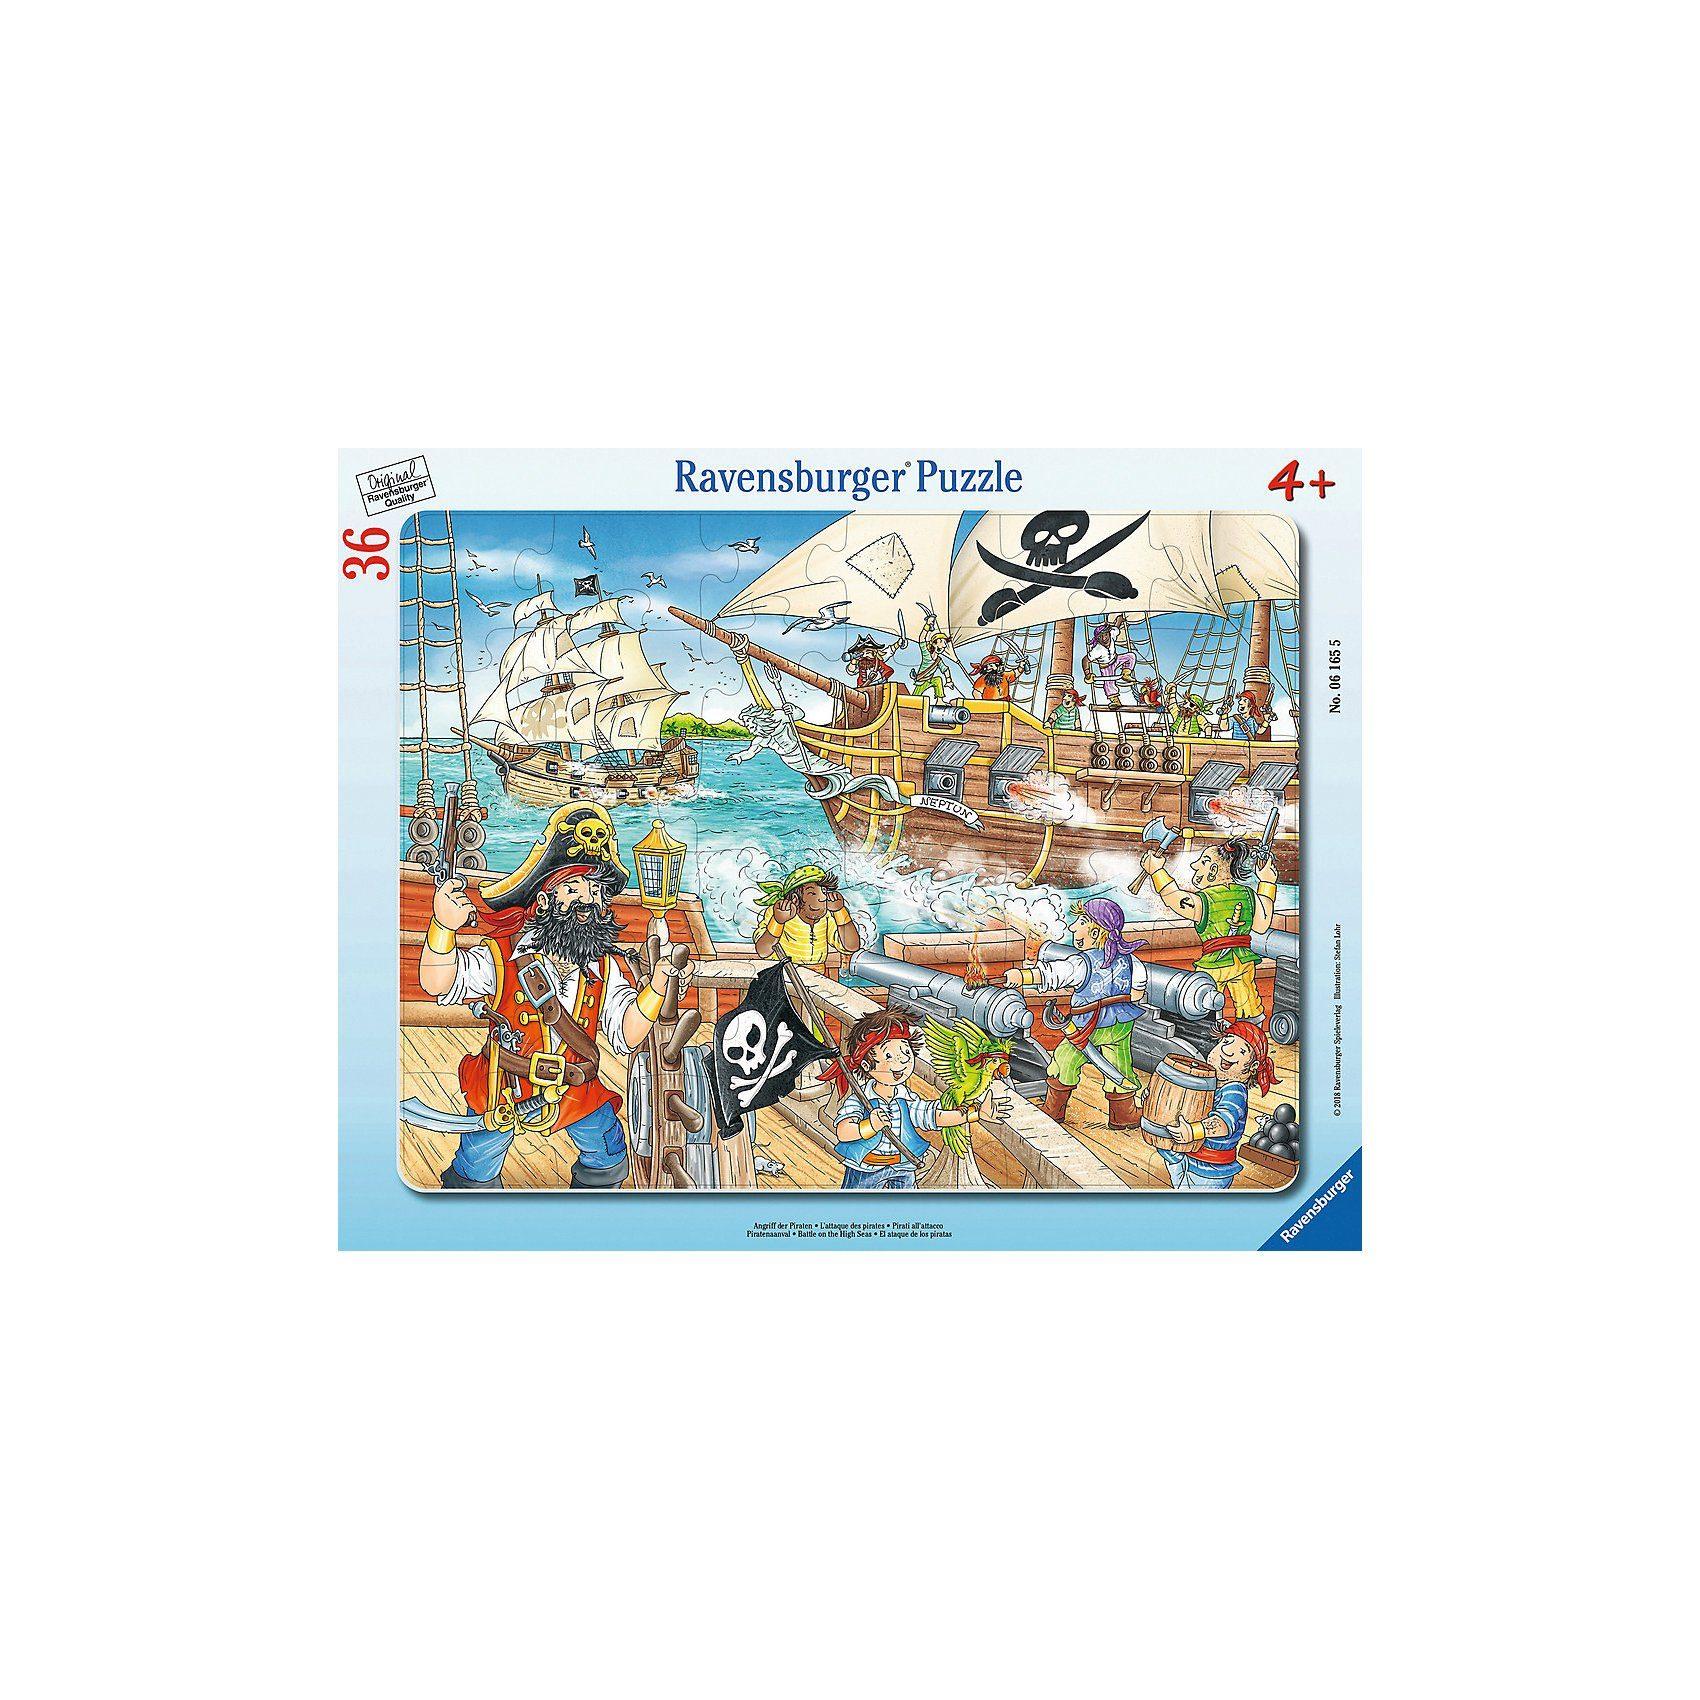 Ravensburger Rahmenpuzzle 36 Teile Angriff der Piraten